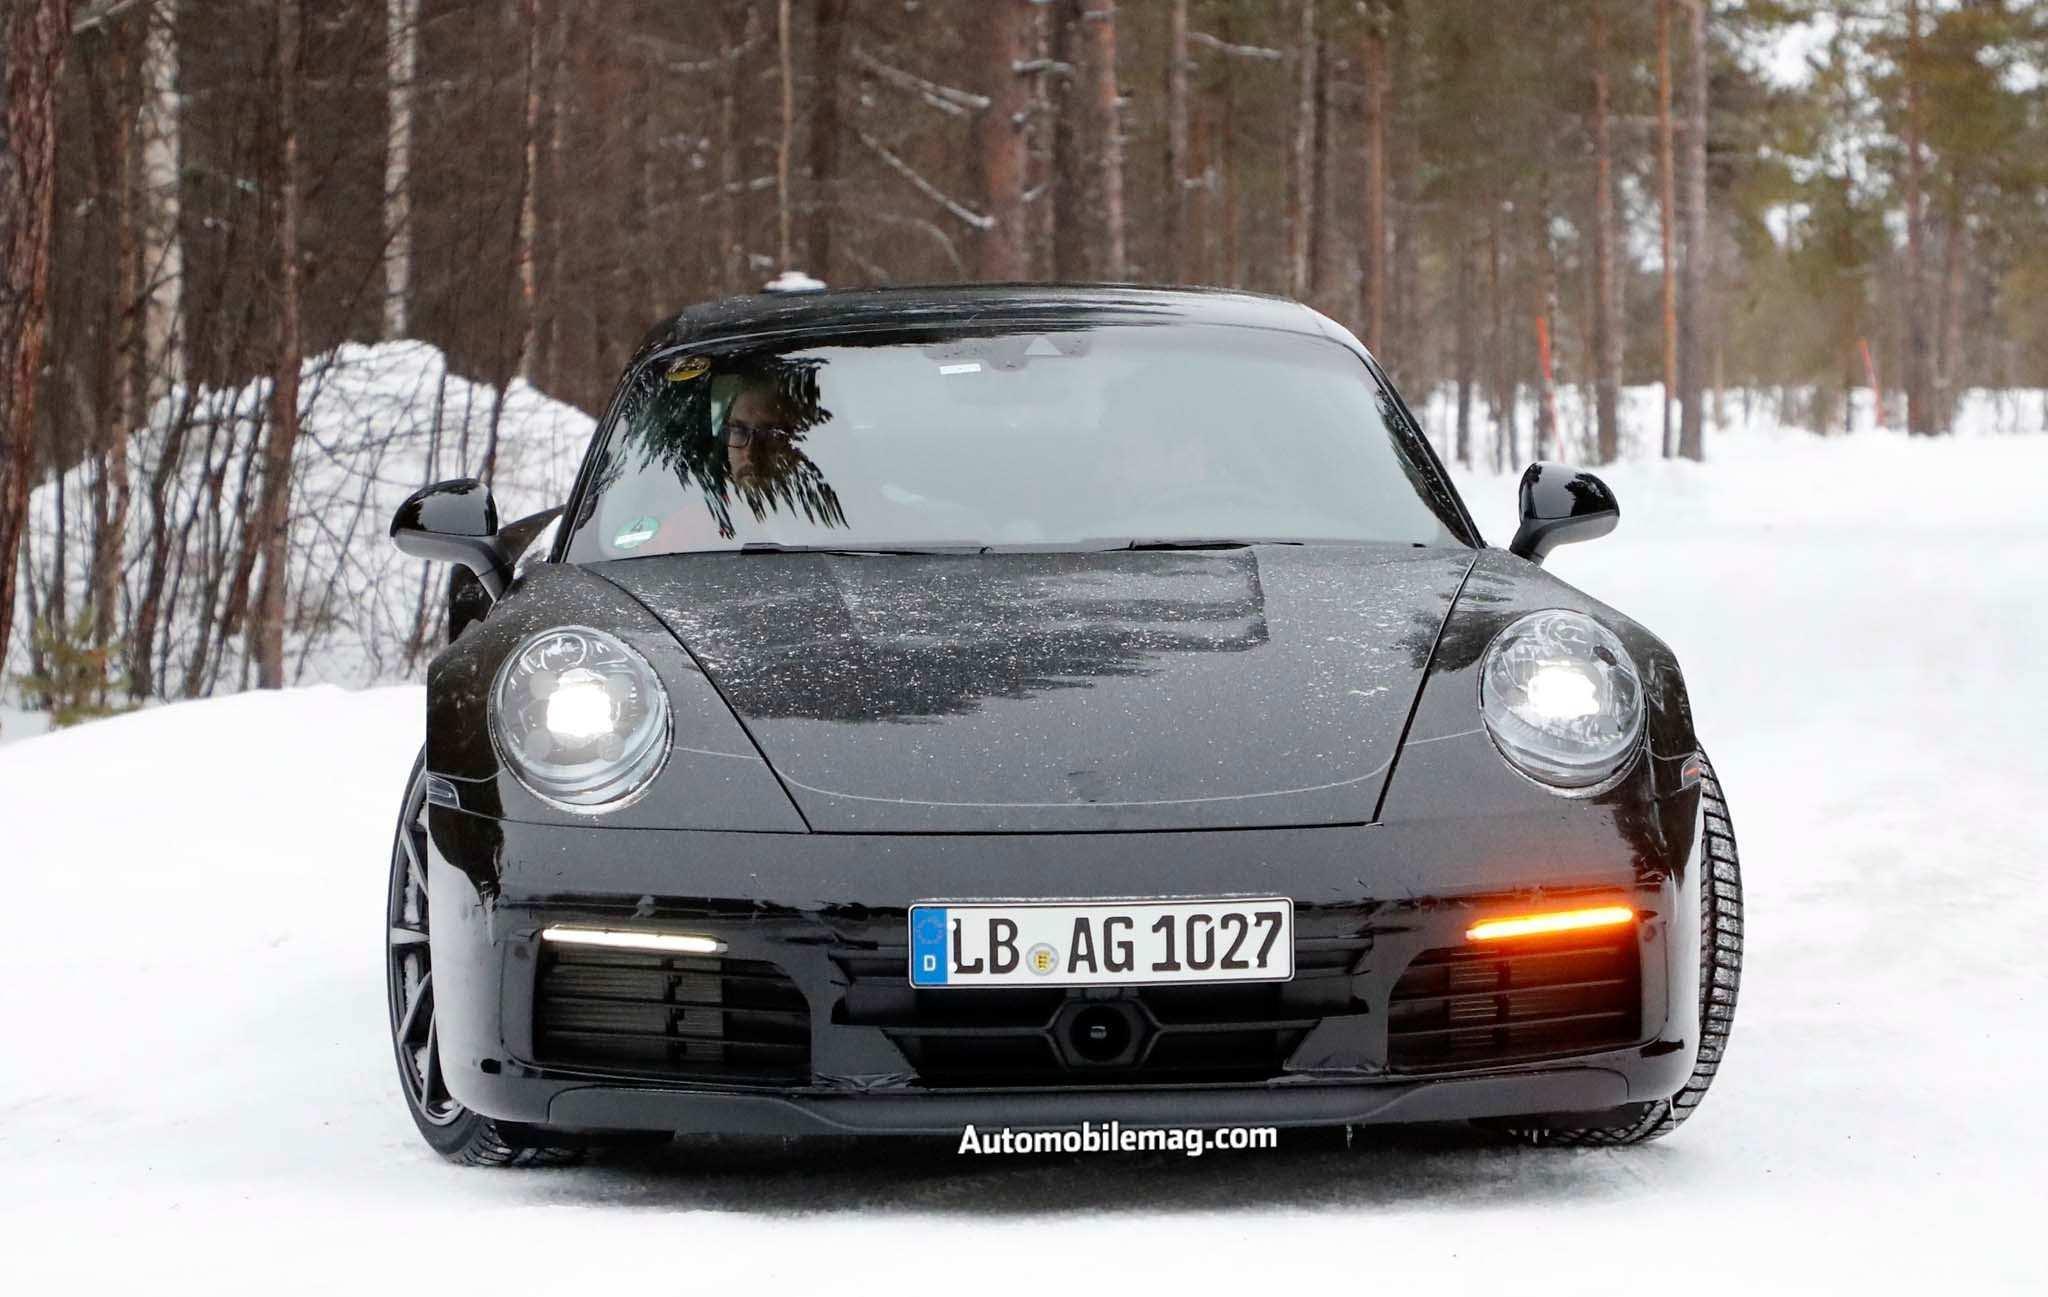 57 Concept of 2019 Porsche Release Date Configurations for 2019 Porsche Release Date